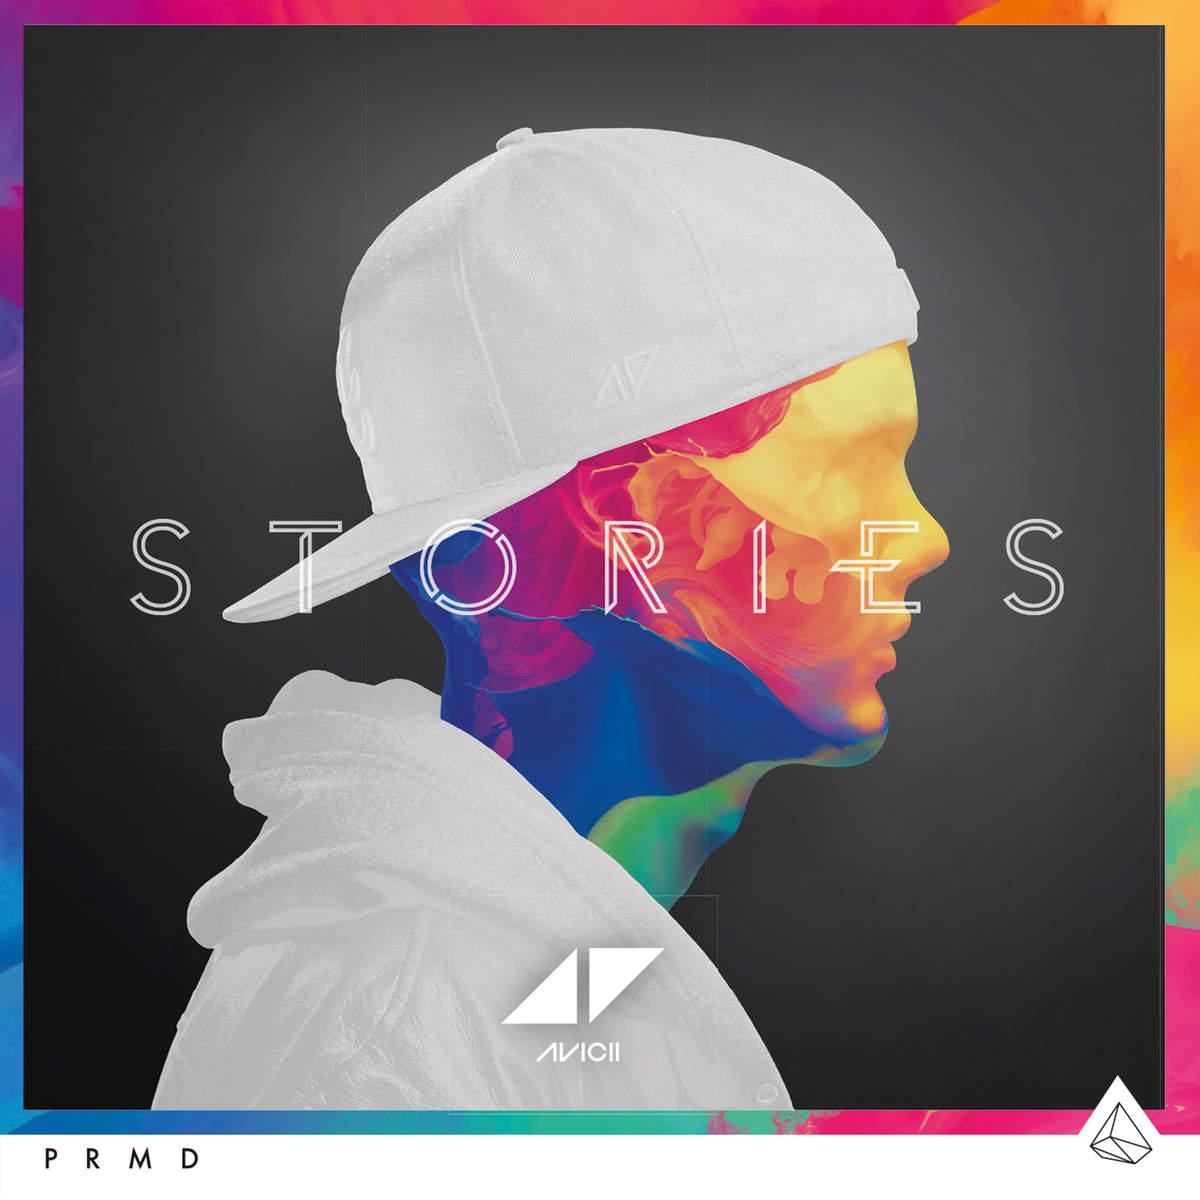 Avicii – Stories